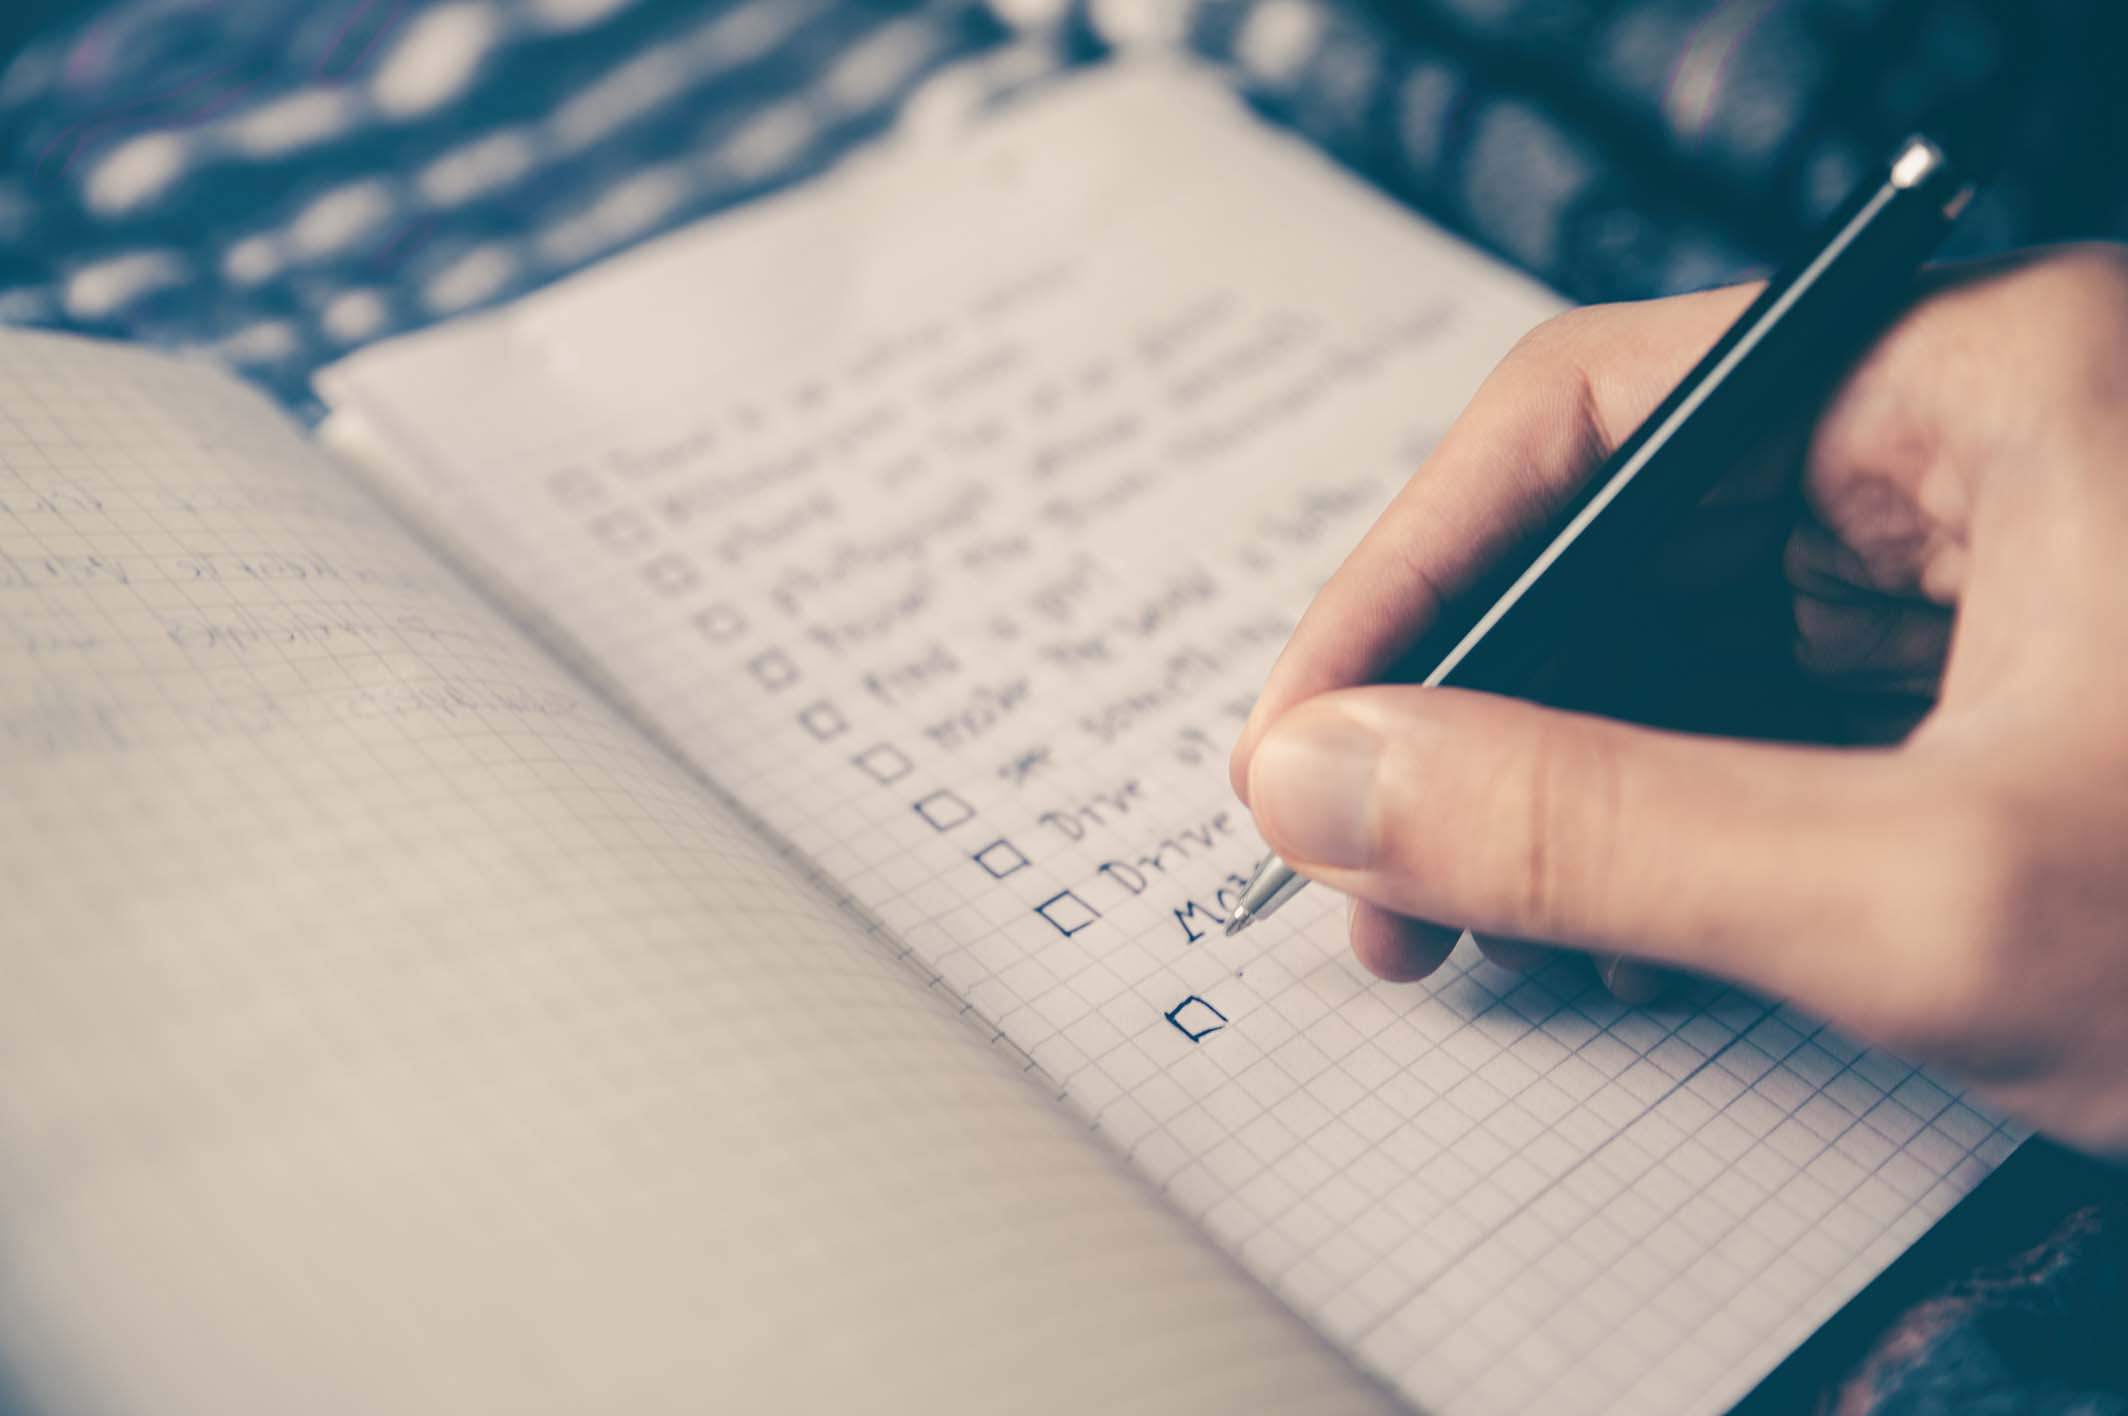 Person marking a checklist